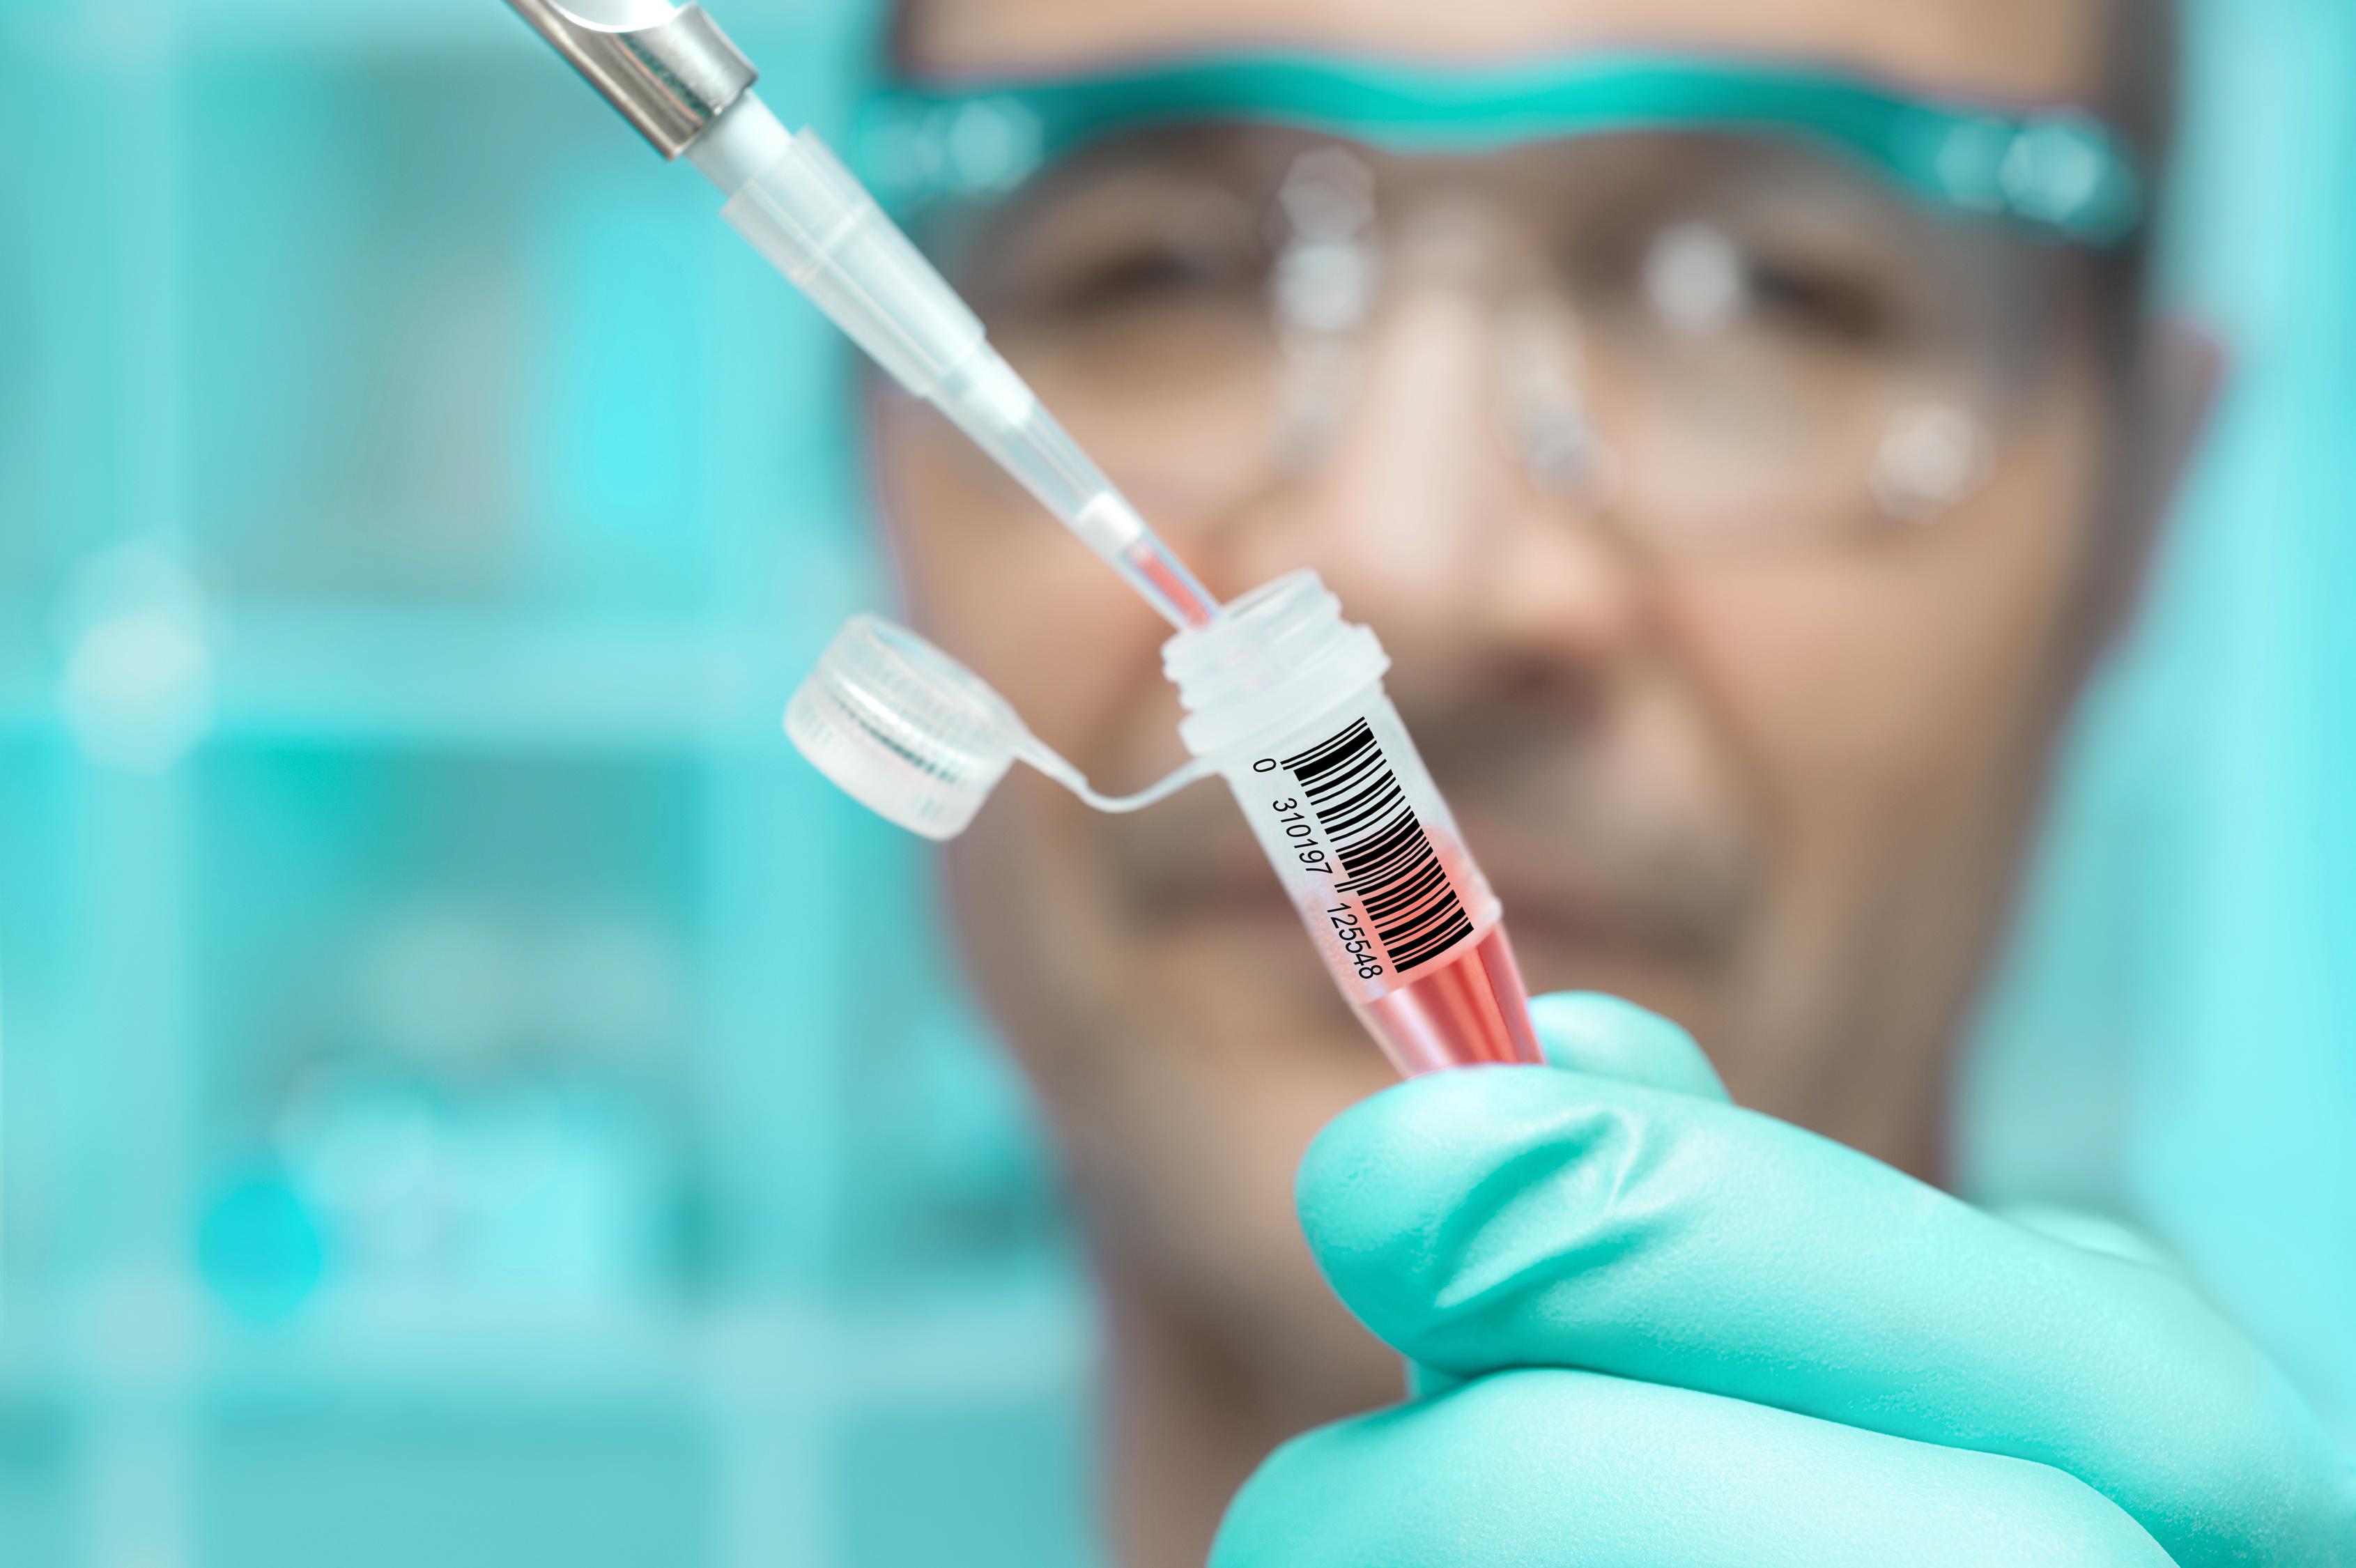 ADMA Biologics Inc stock flies after its ASCENIV intravenous